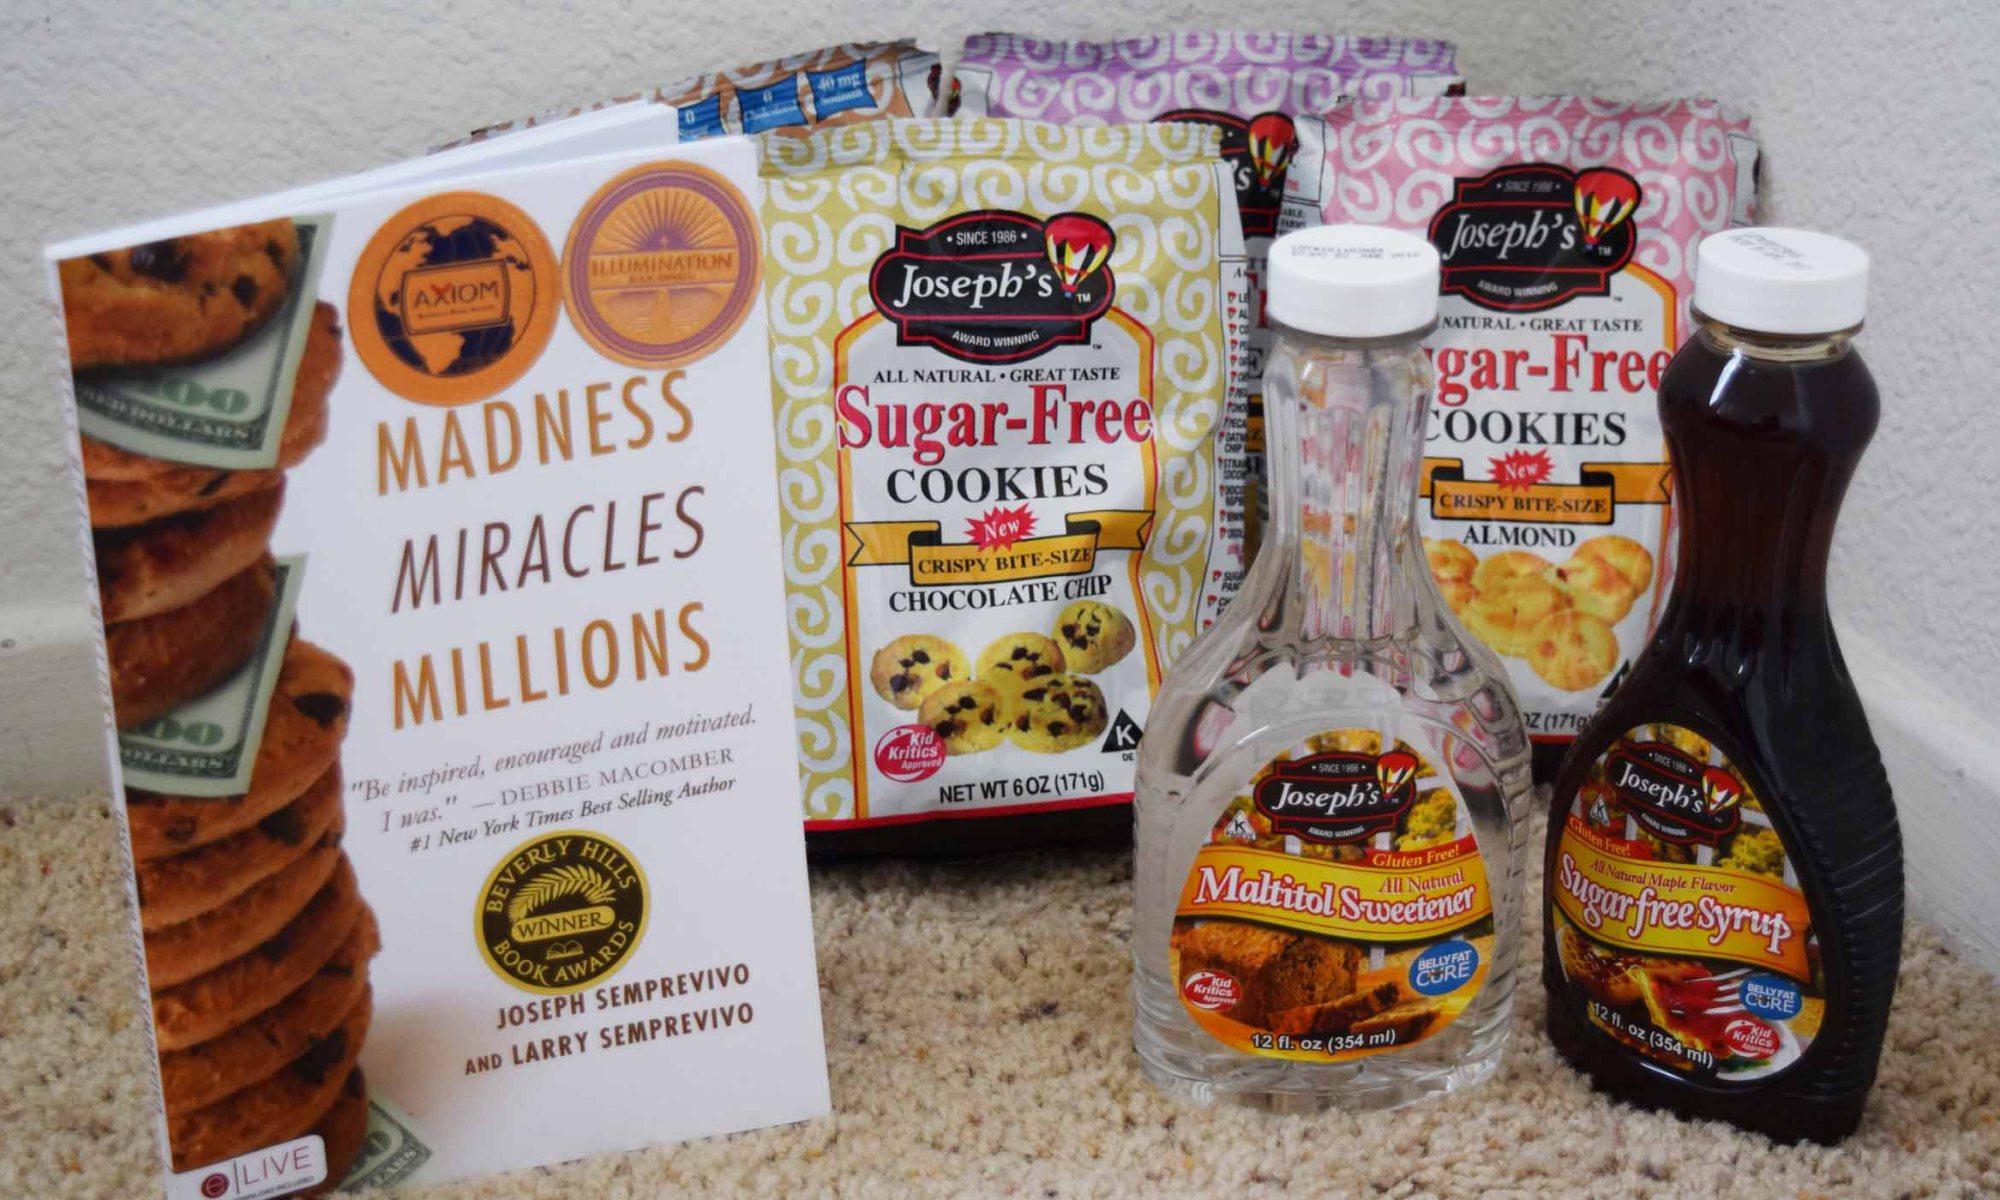 Joseph's Sugar Free Cookies